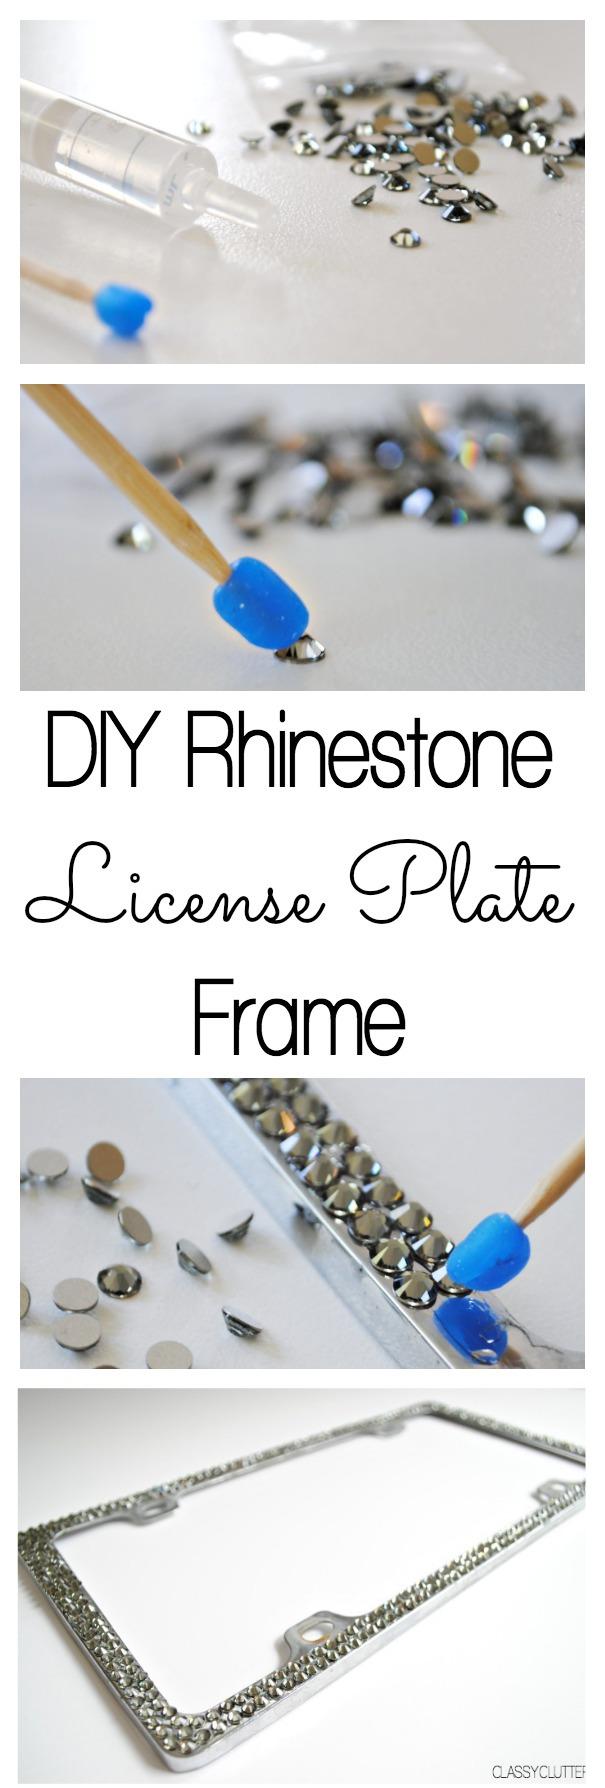 DIY Rhinestone License Plate Frame